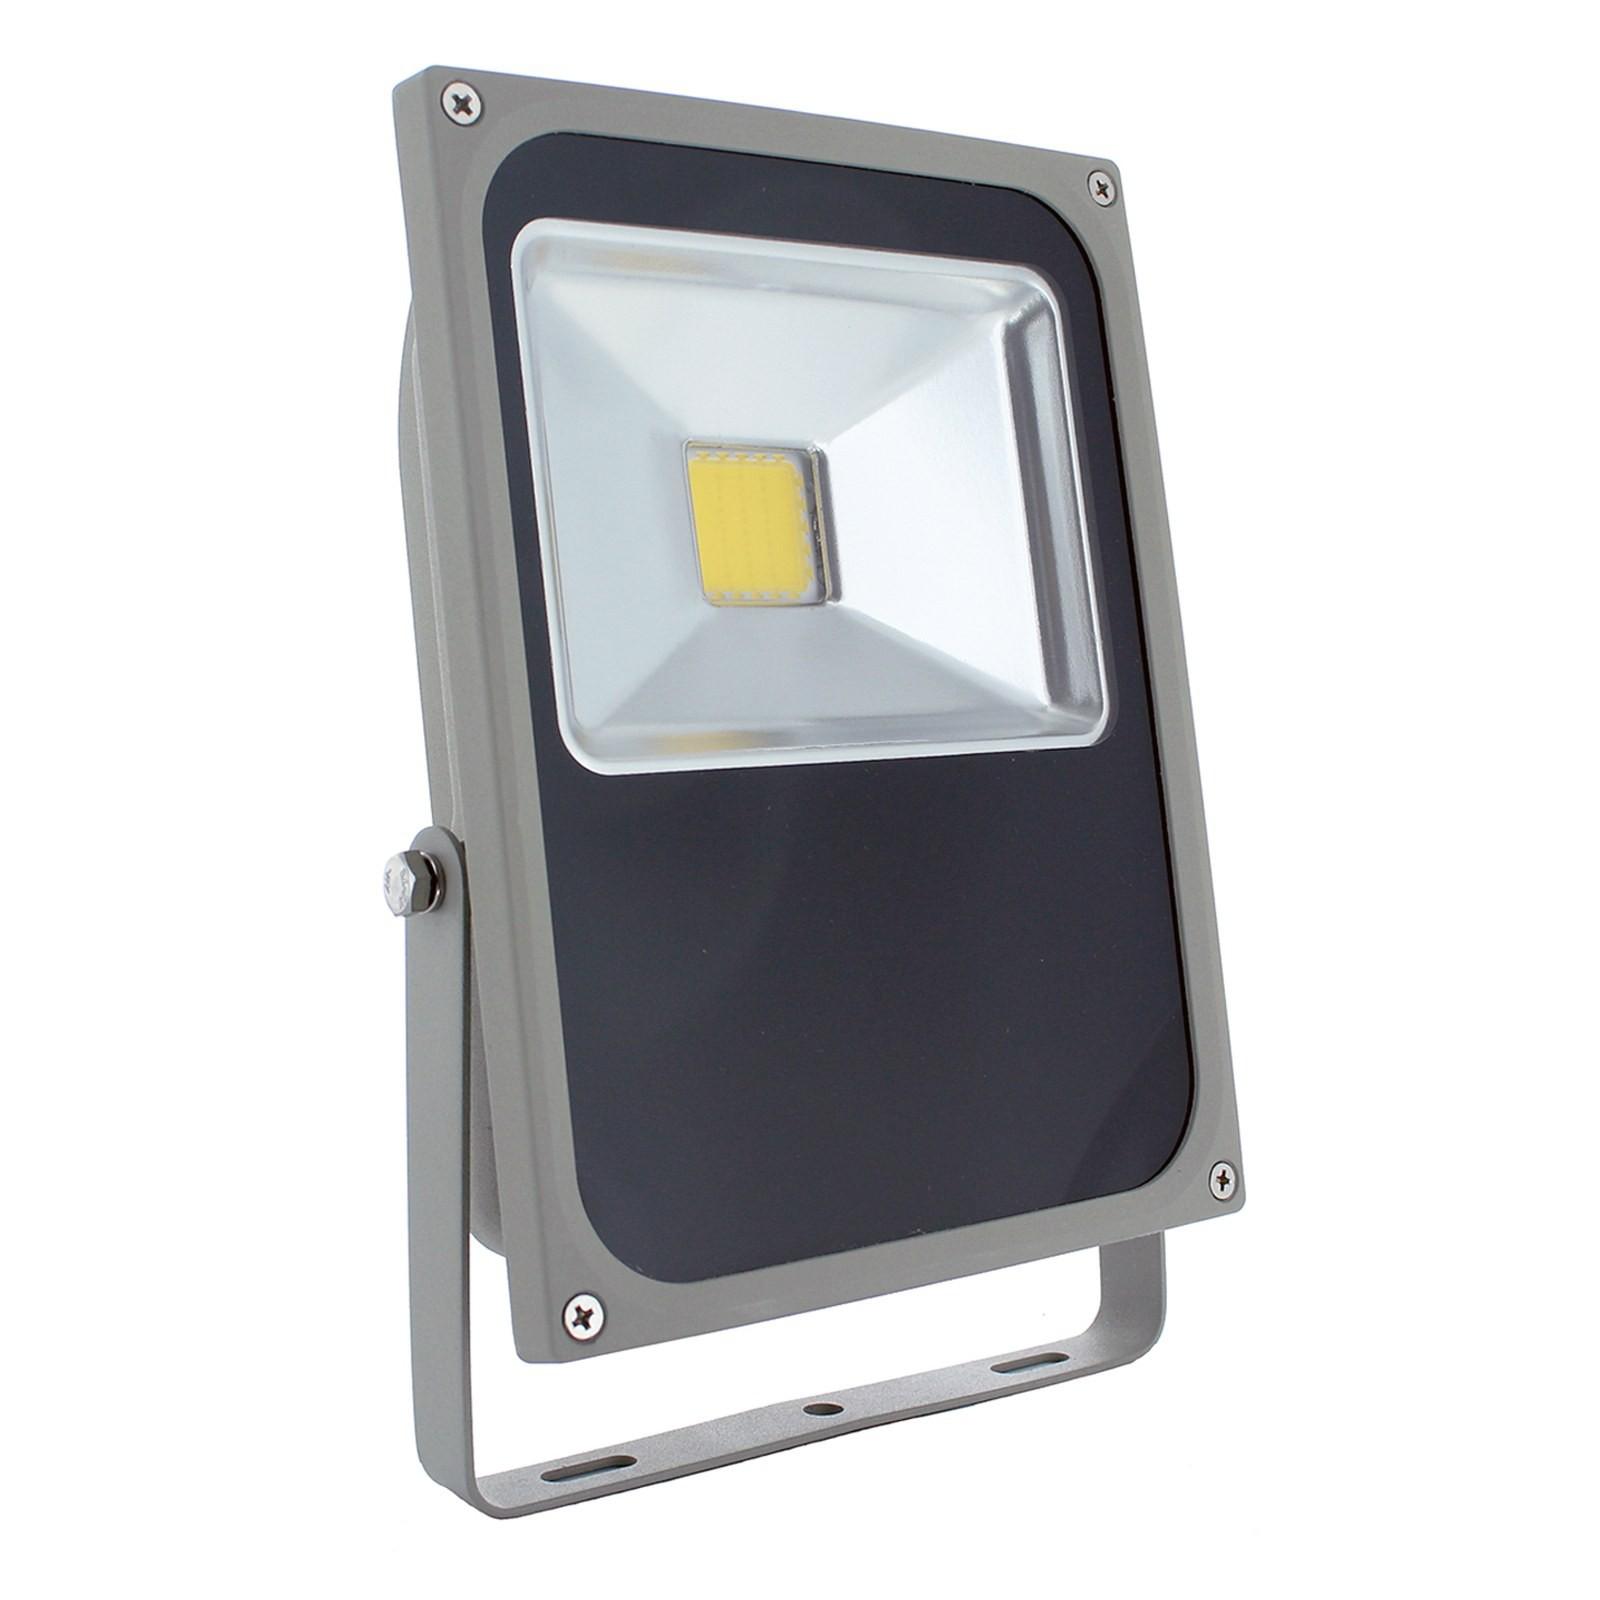 Faretto faro led 70 watt per esterno luce bianca naturale for Luce bianca led